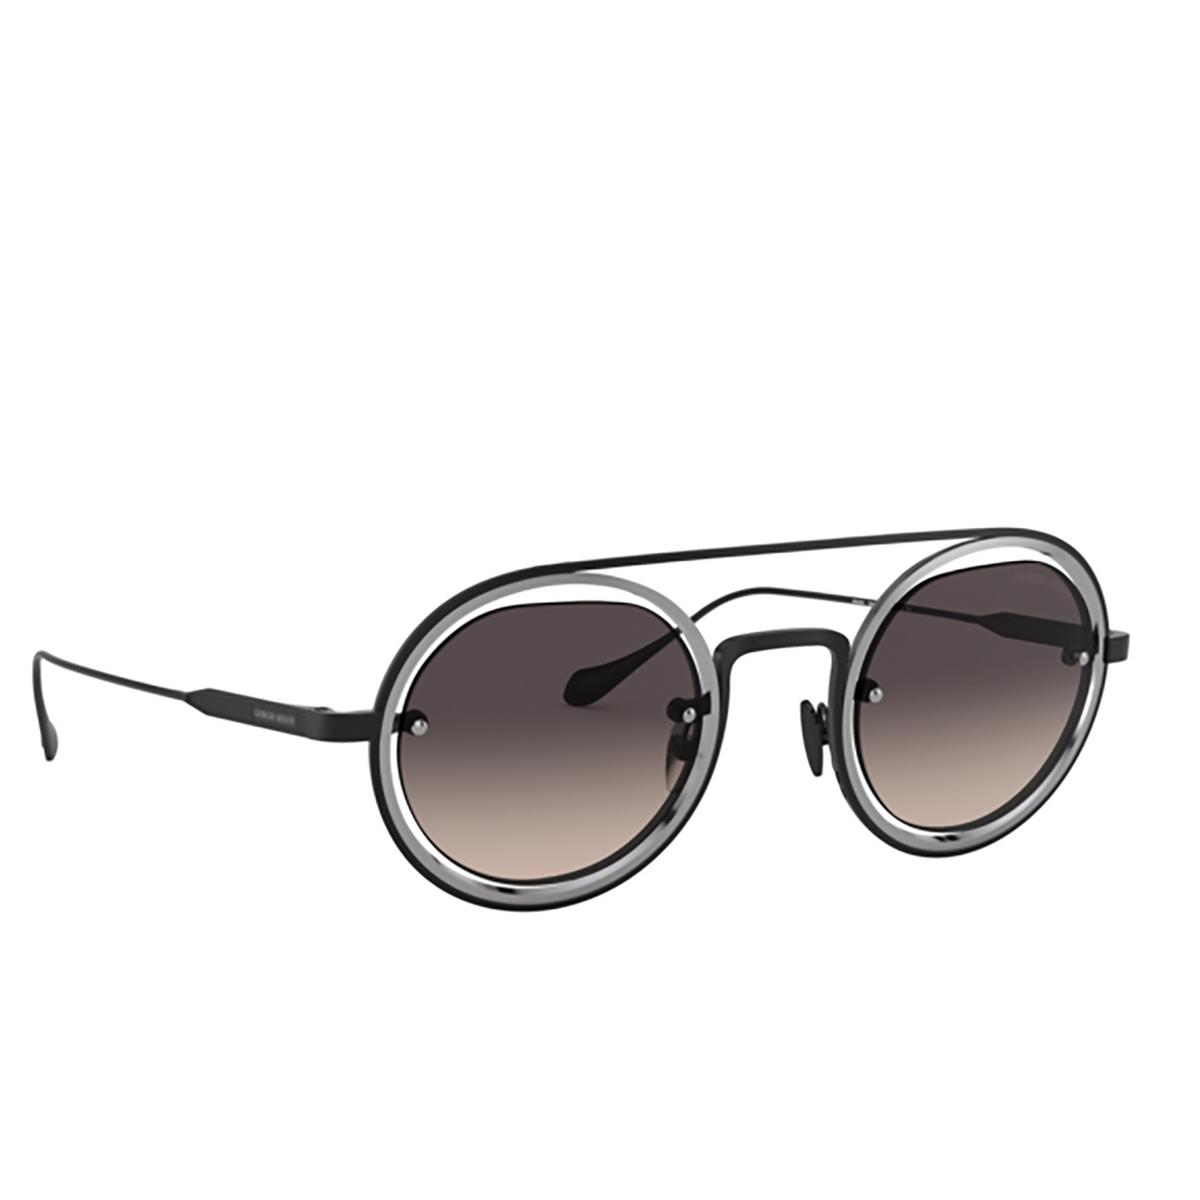 Giorgio Armani® Round Sunglasses: AR6085 color Matte Black / Gunmetal 326111 - three-quarters view.